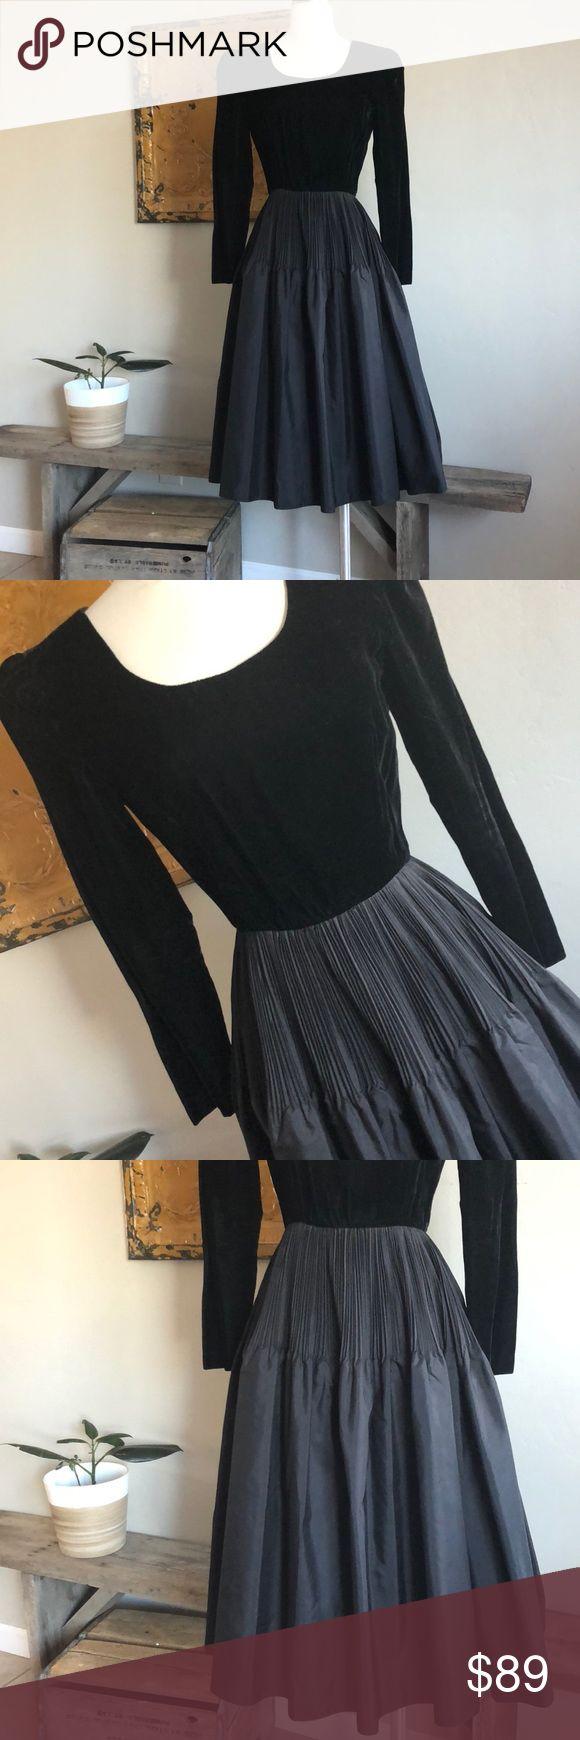 Vintage Black Cocktail Dress Very Elegant Velvet Bust w/Taffeta Skirt In Excellent Used Condition. size: 8 Clair de Lure Dresses Midi